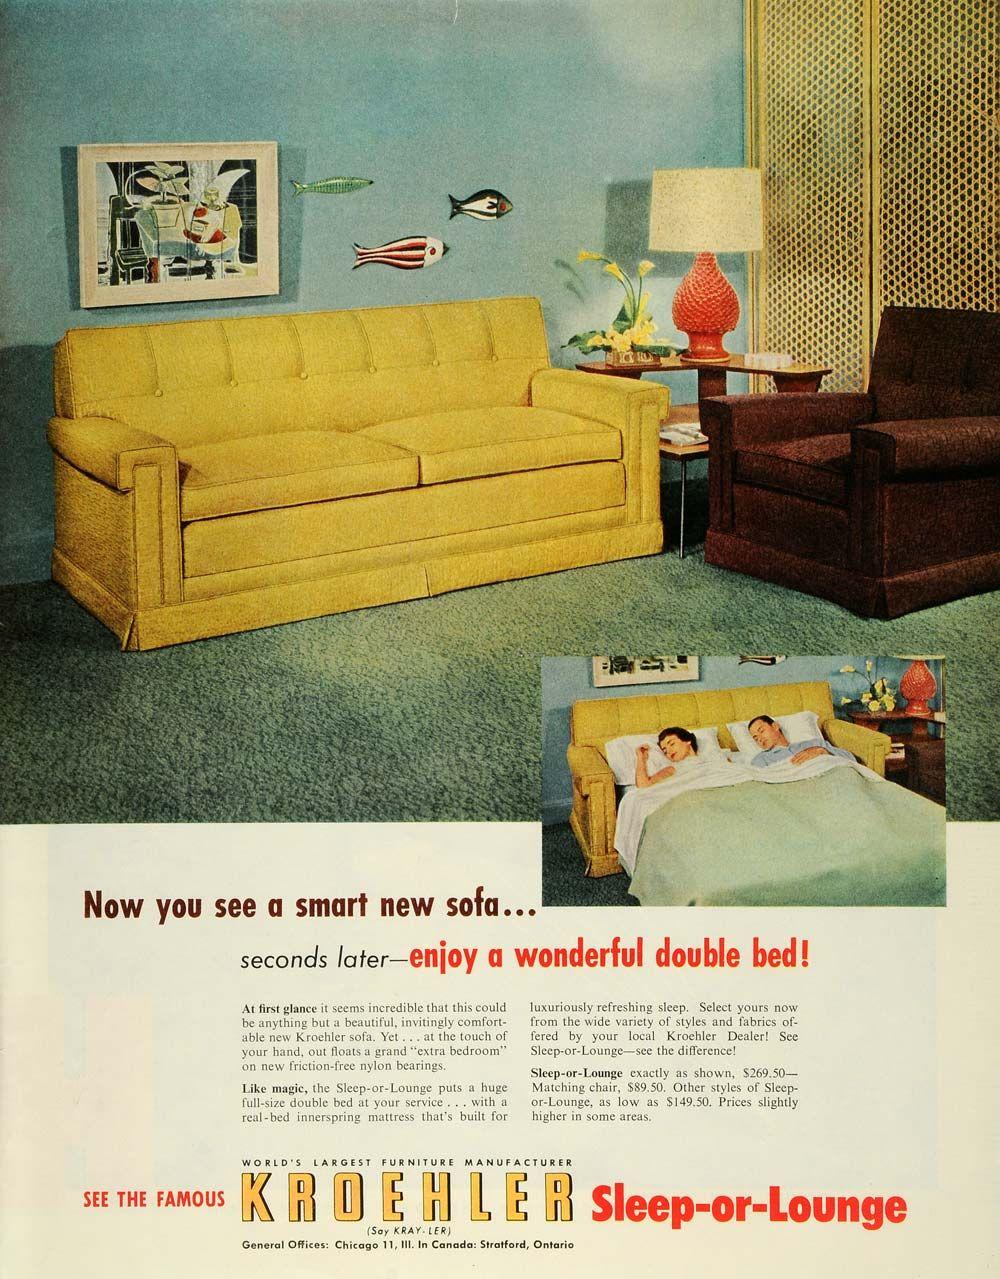 1953 Ad Kroehler Chicago Sleep-or-Lounge Sofa-Bed Futon Furniture Antique - 1953 Ad Kroehler Chicago Sleep-or-Lounge Sofa-Bed Futon Furniture